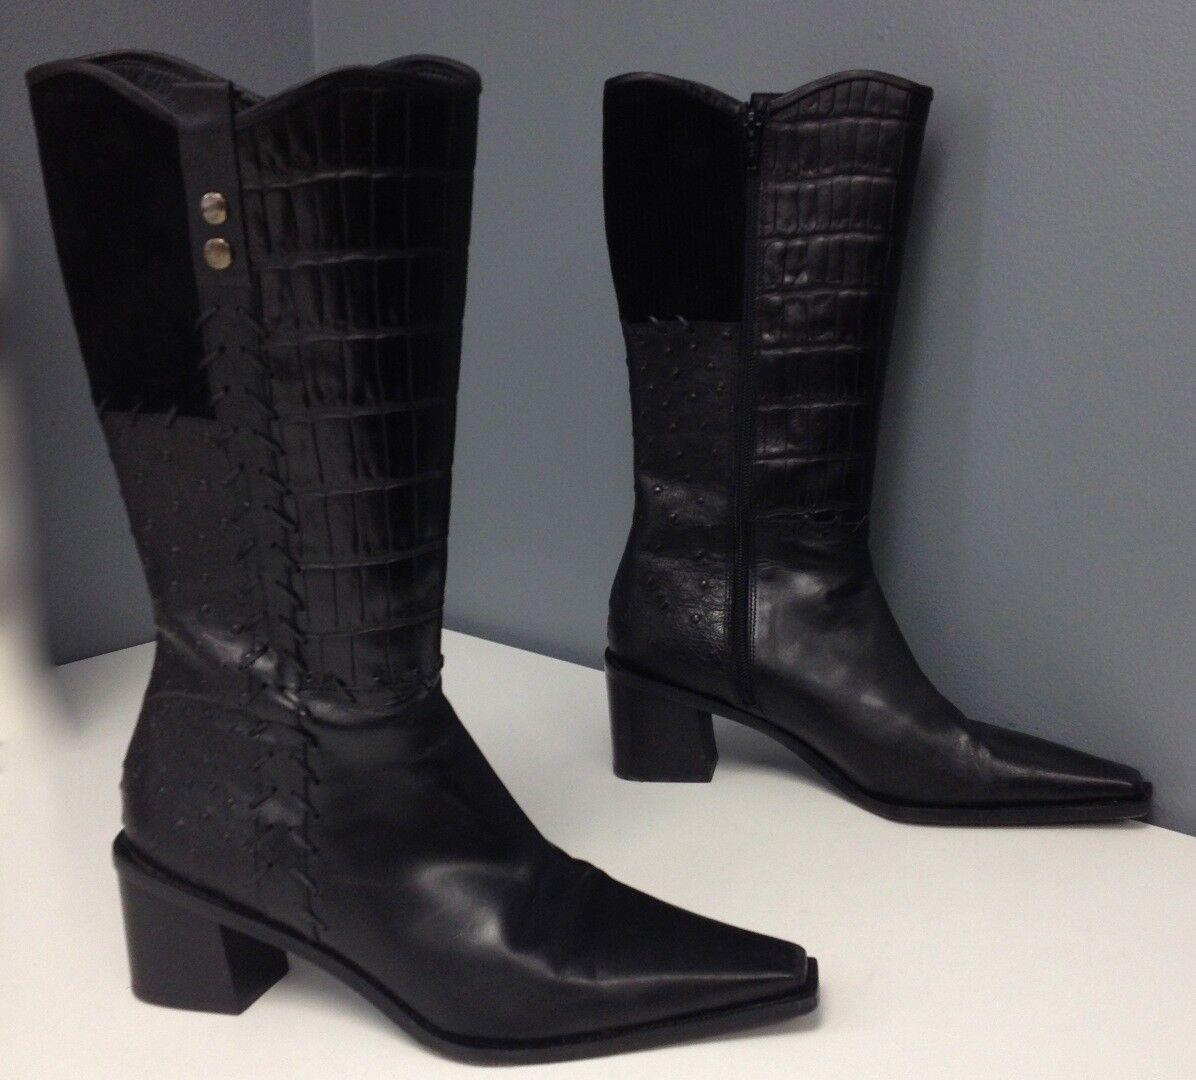 Stuart Weitzman textura de cuero negro Multi bloque bloque bloque Talón Cremallera lateral Bota Talla 9 B4298 9d5623